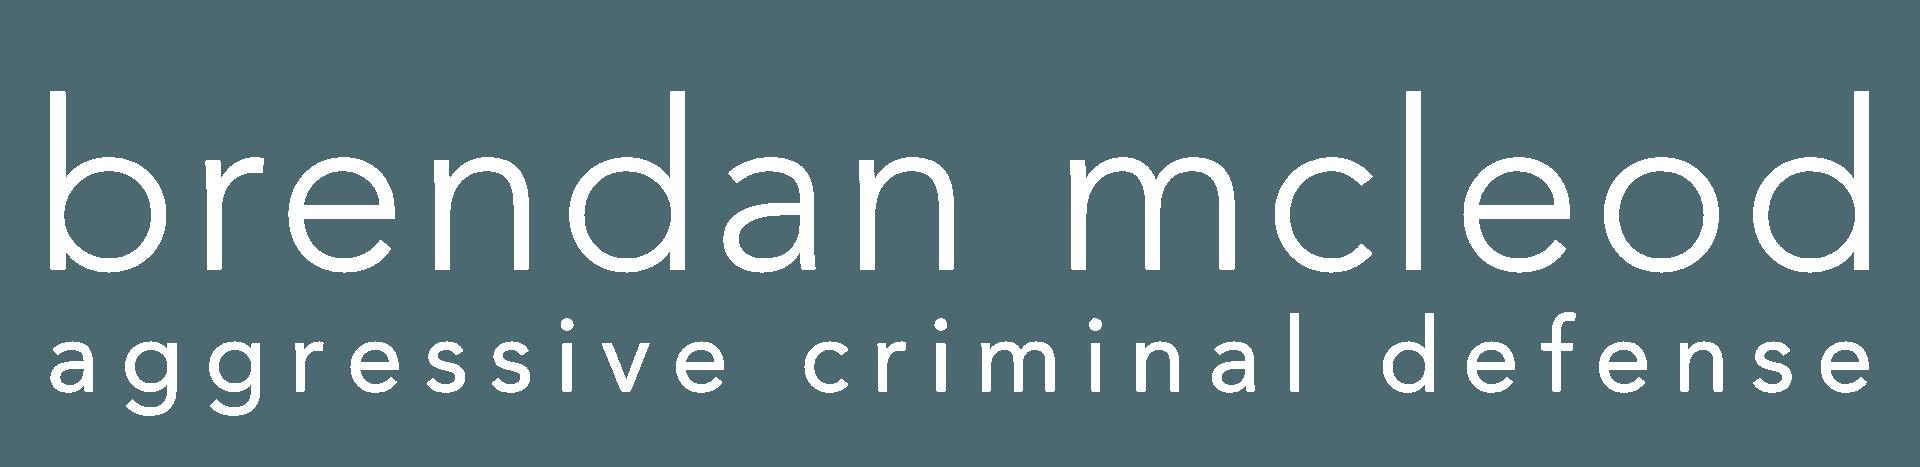 Louisville Criminal Defense Lawyer - Criminal Defense Attorney